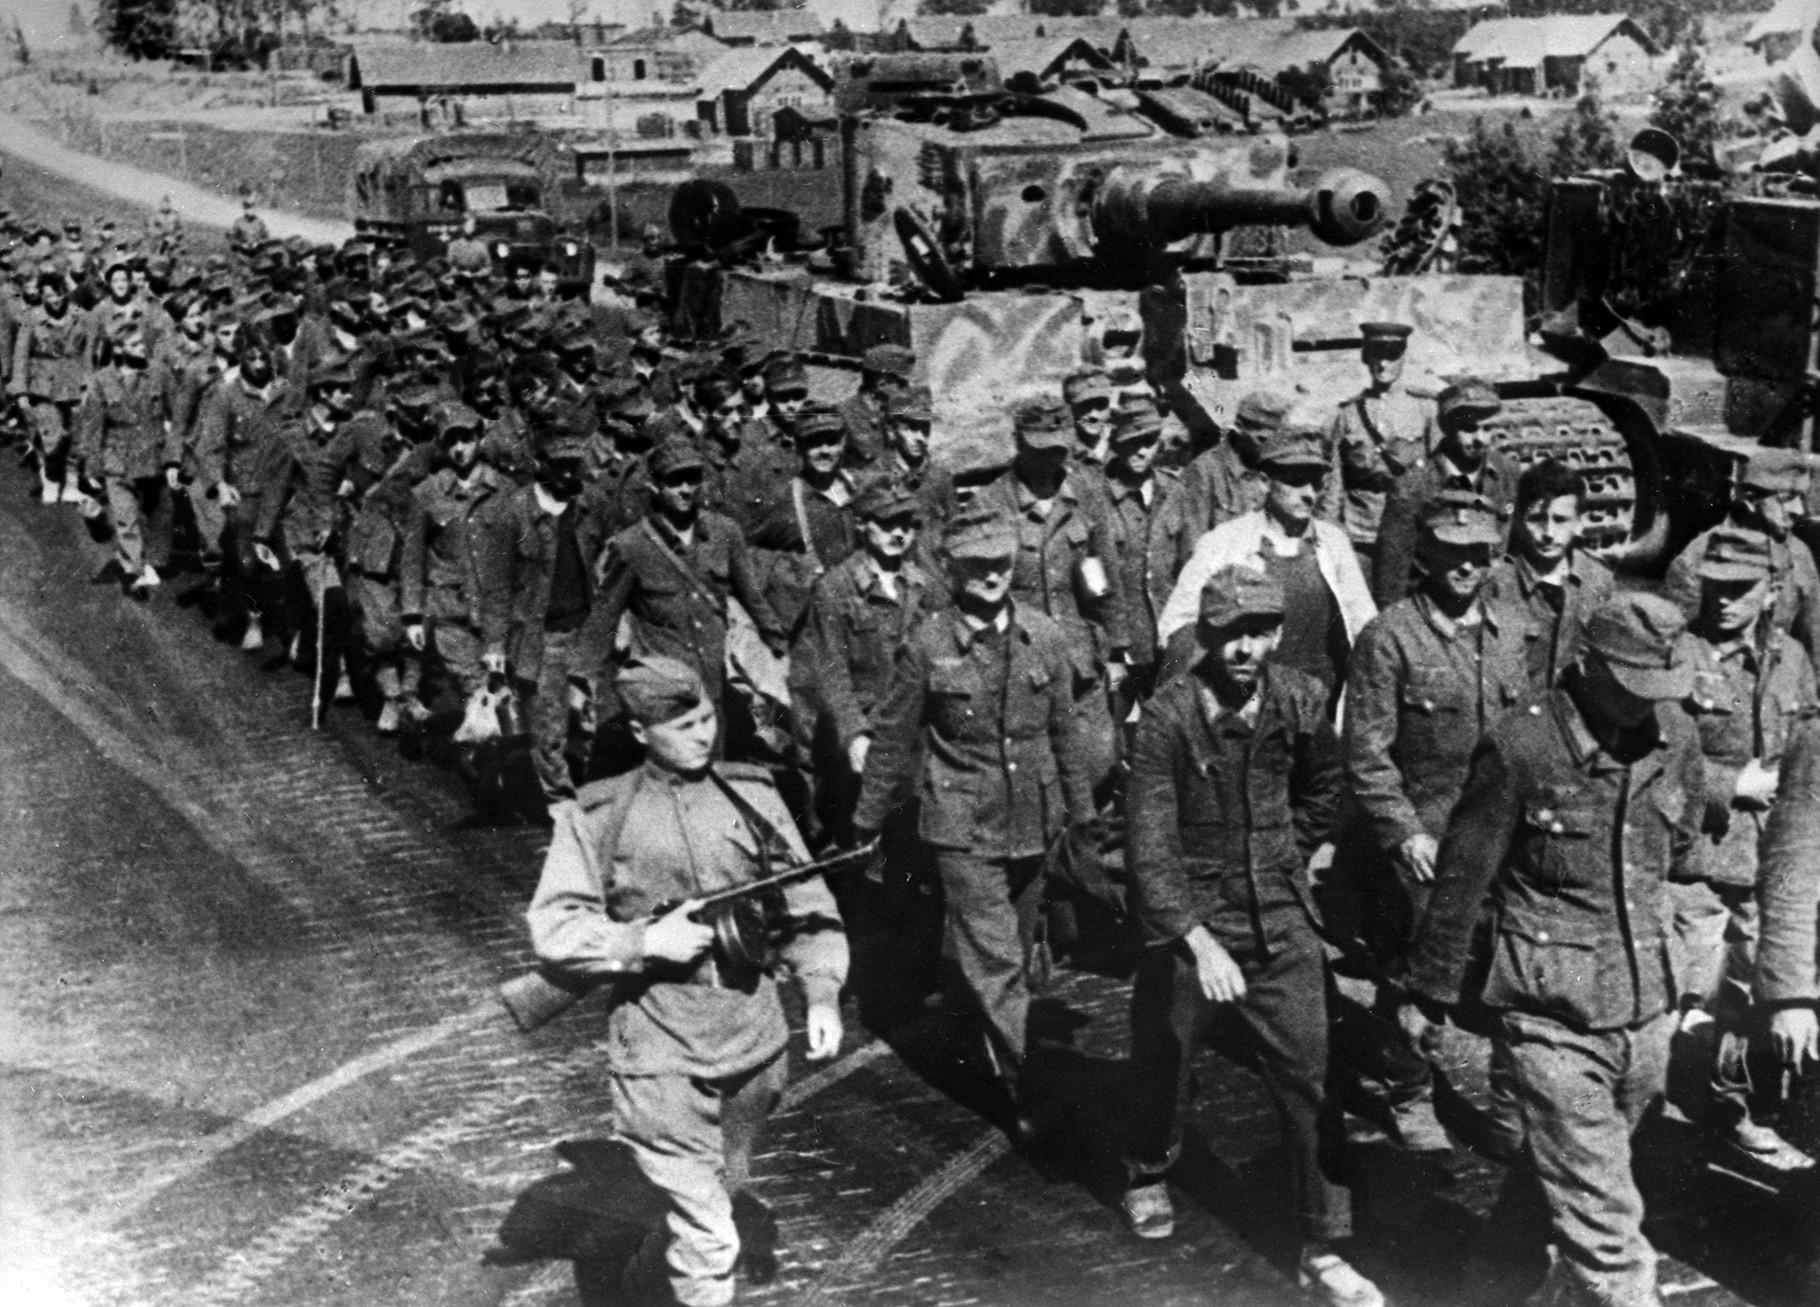 Велики отаџбински рат 1941-1945. Операција